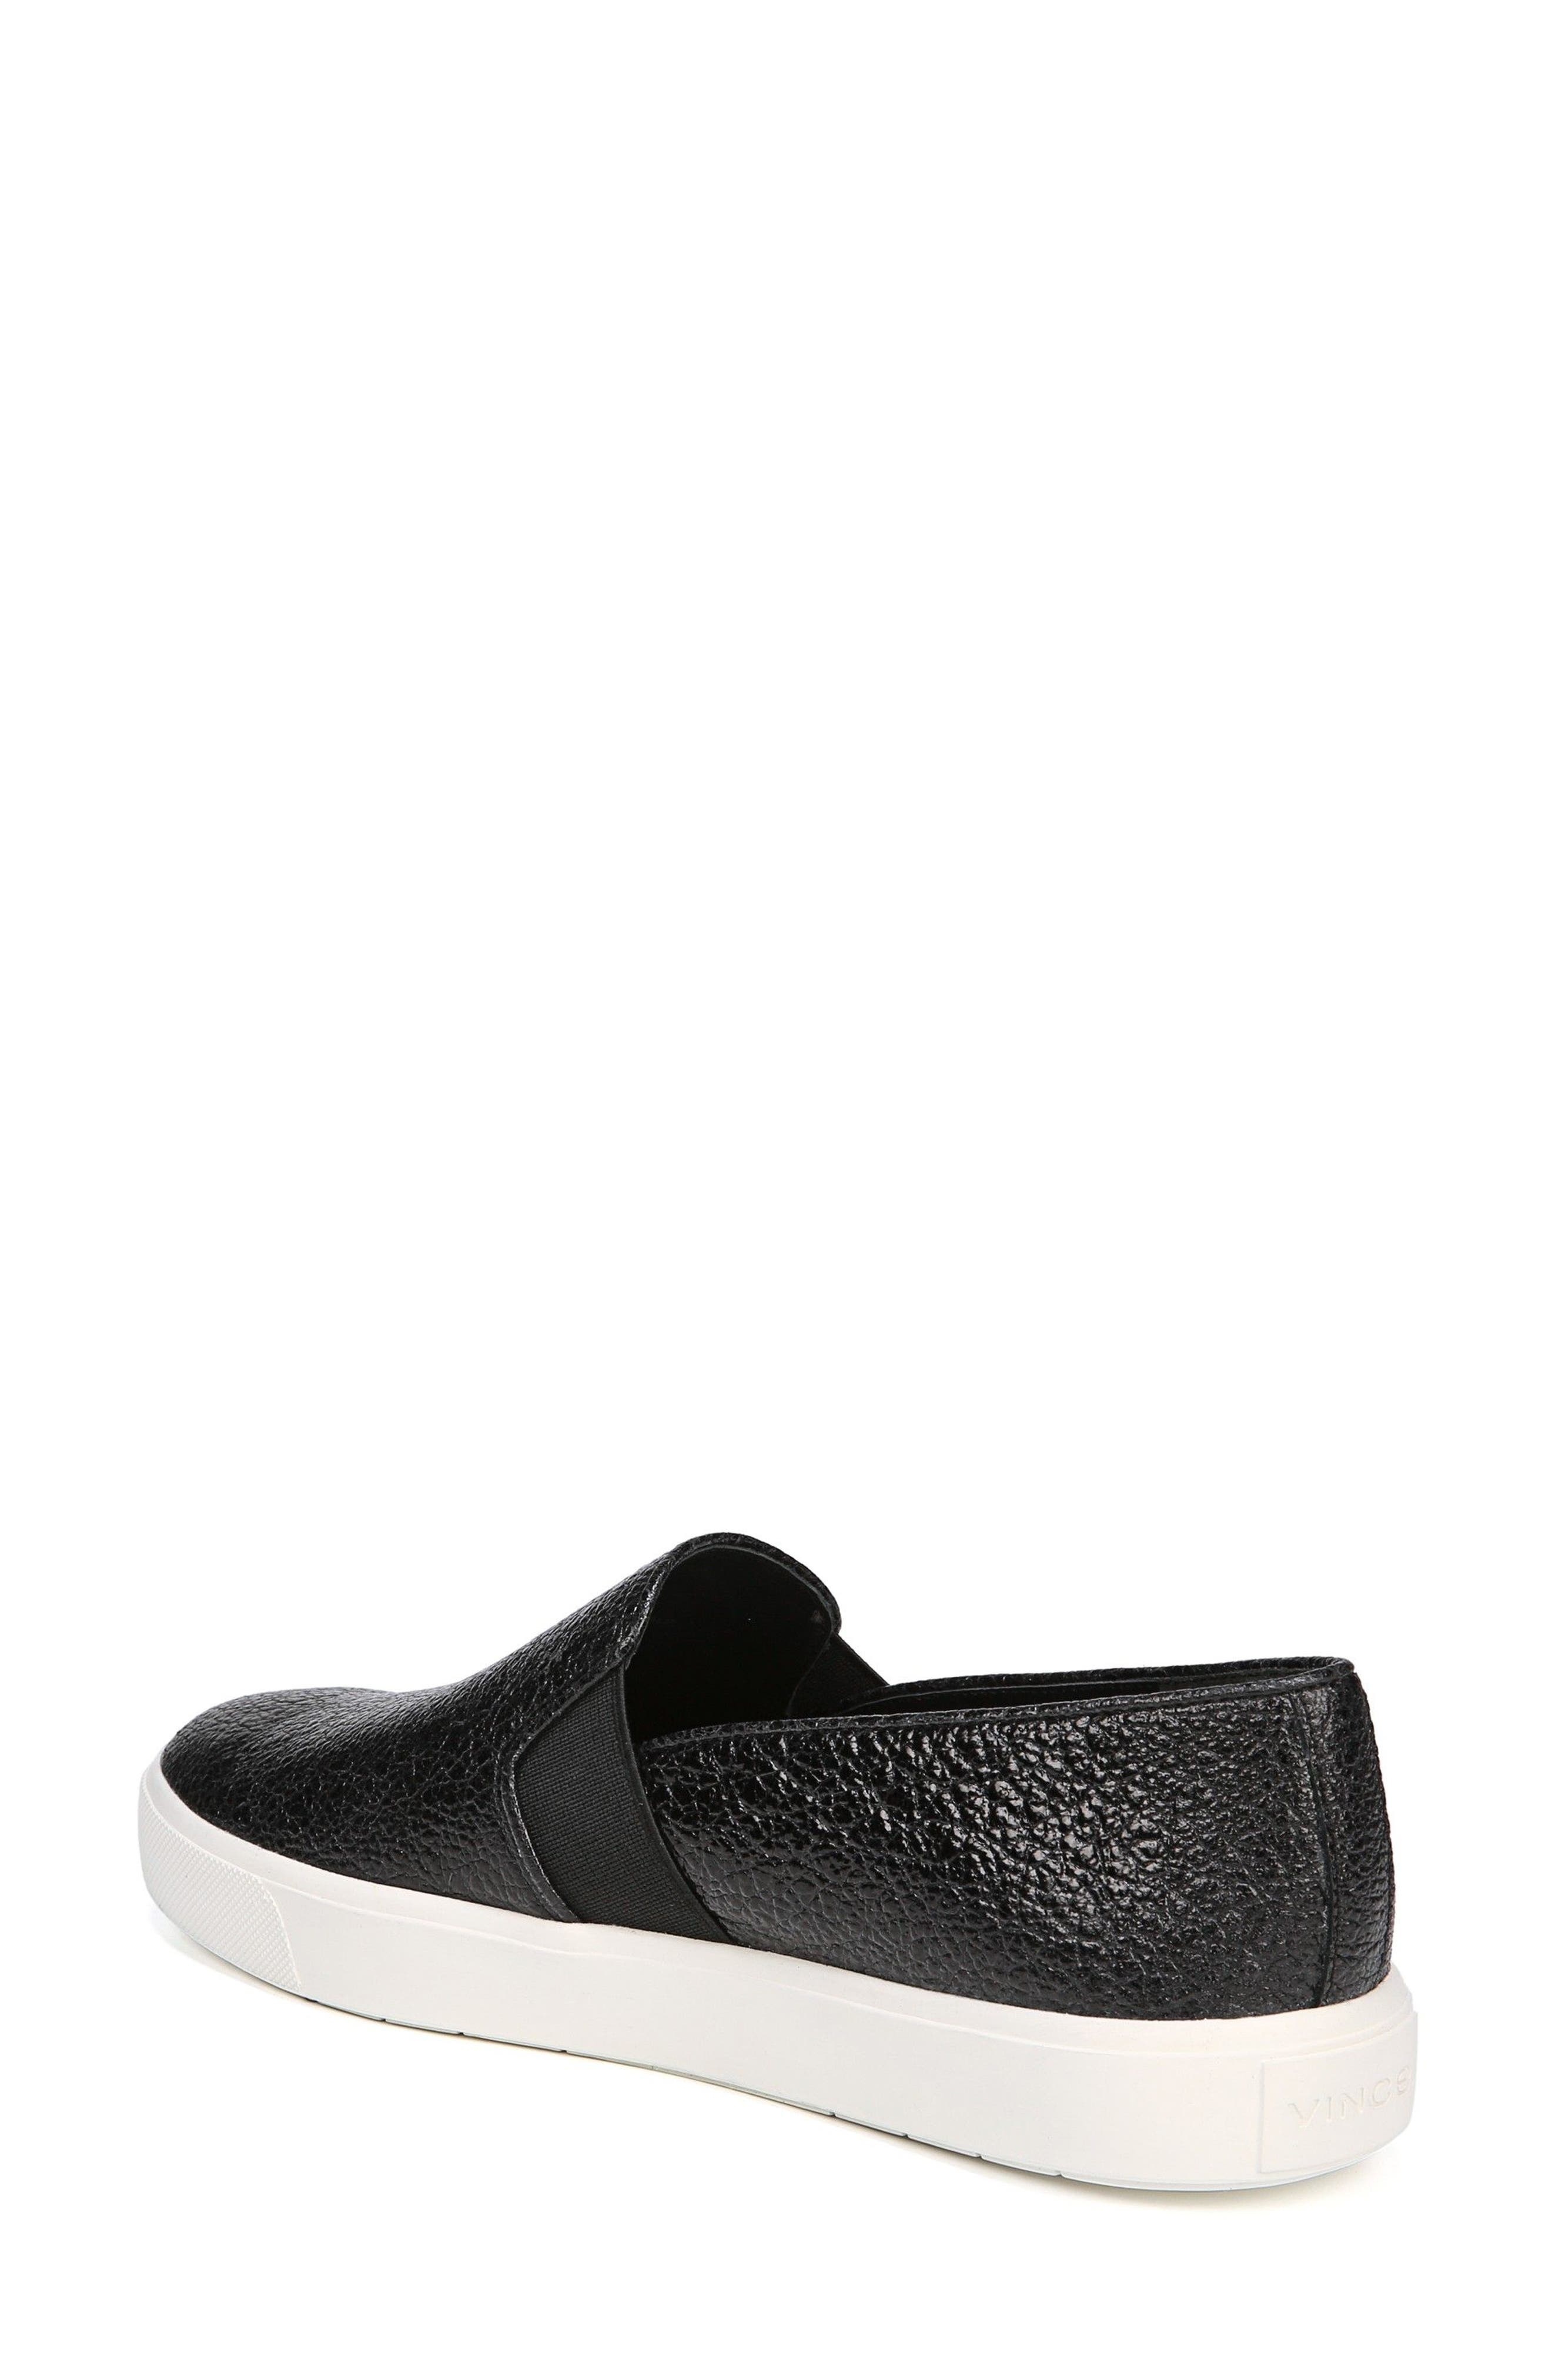 'Blair 12' Leather Slip-On Sneaker,                             Alternate thumbnail 2, color,                             BLACK LEATHER